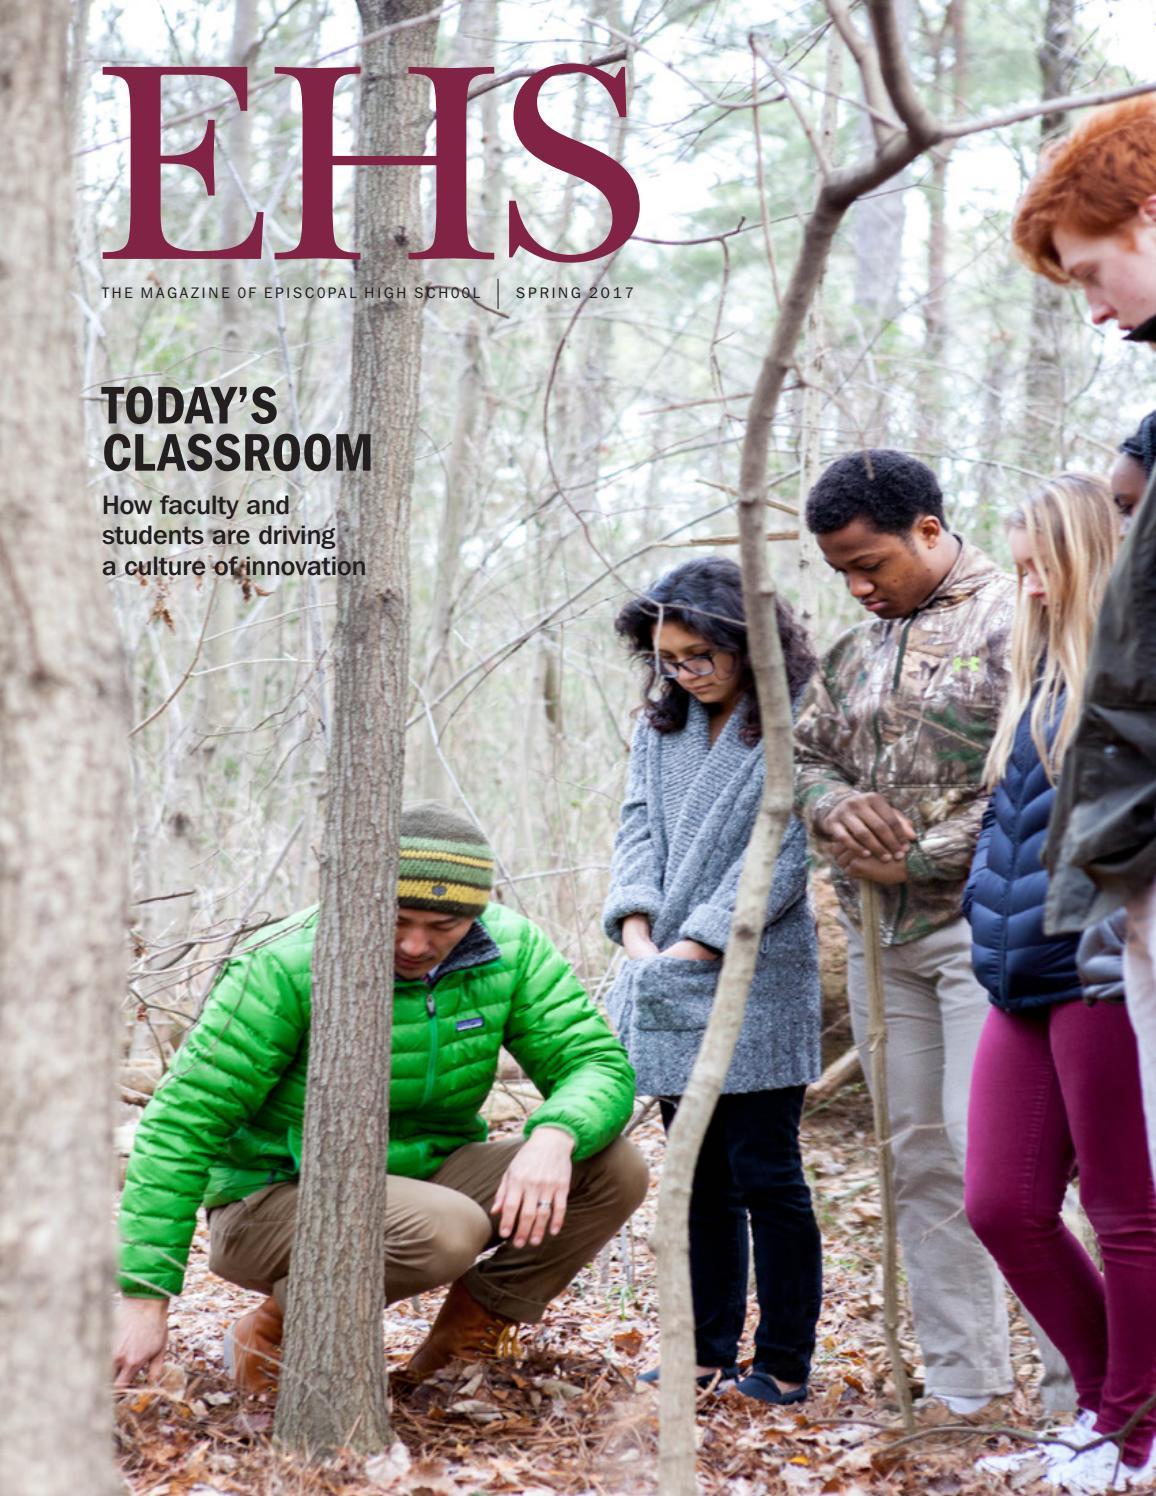 9b3a211600 EHS: The Magazine of Episcopal High School (Spring 2017) by Episcopal High  School - issuu